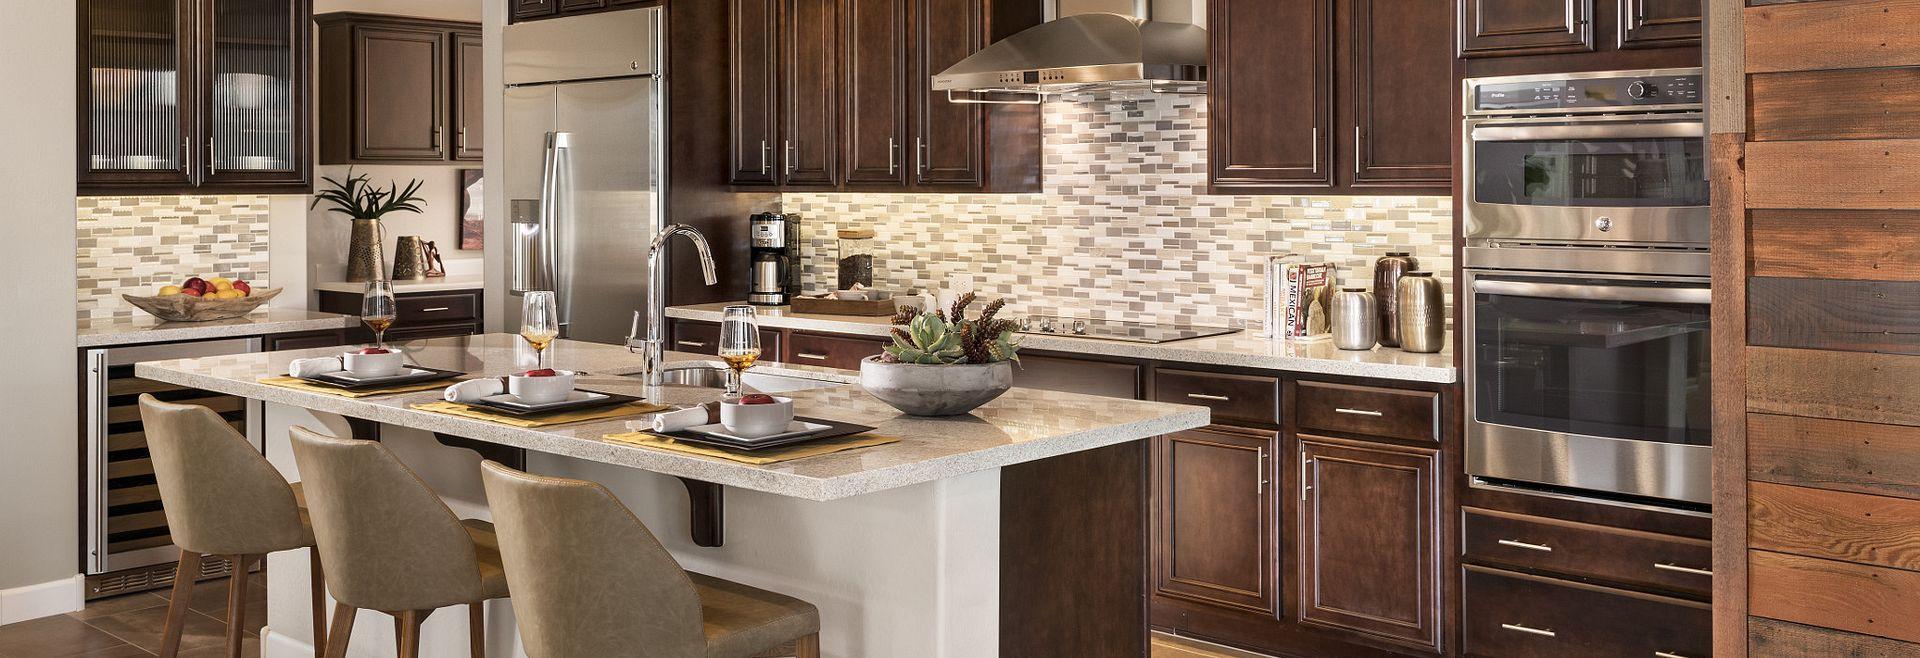 Mosaic Model Kitchen